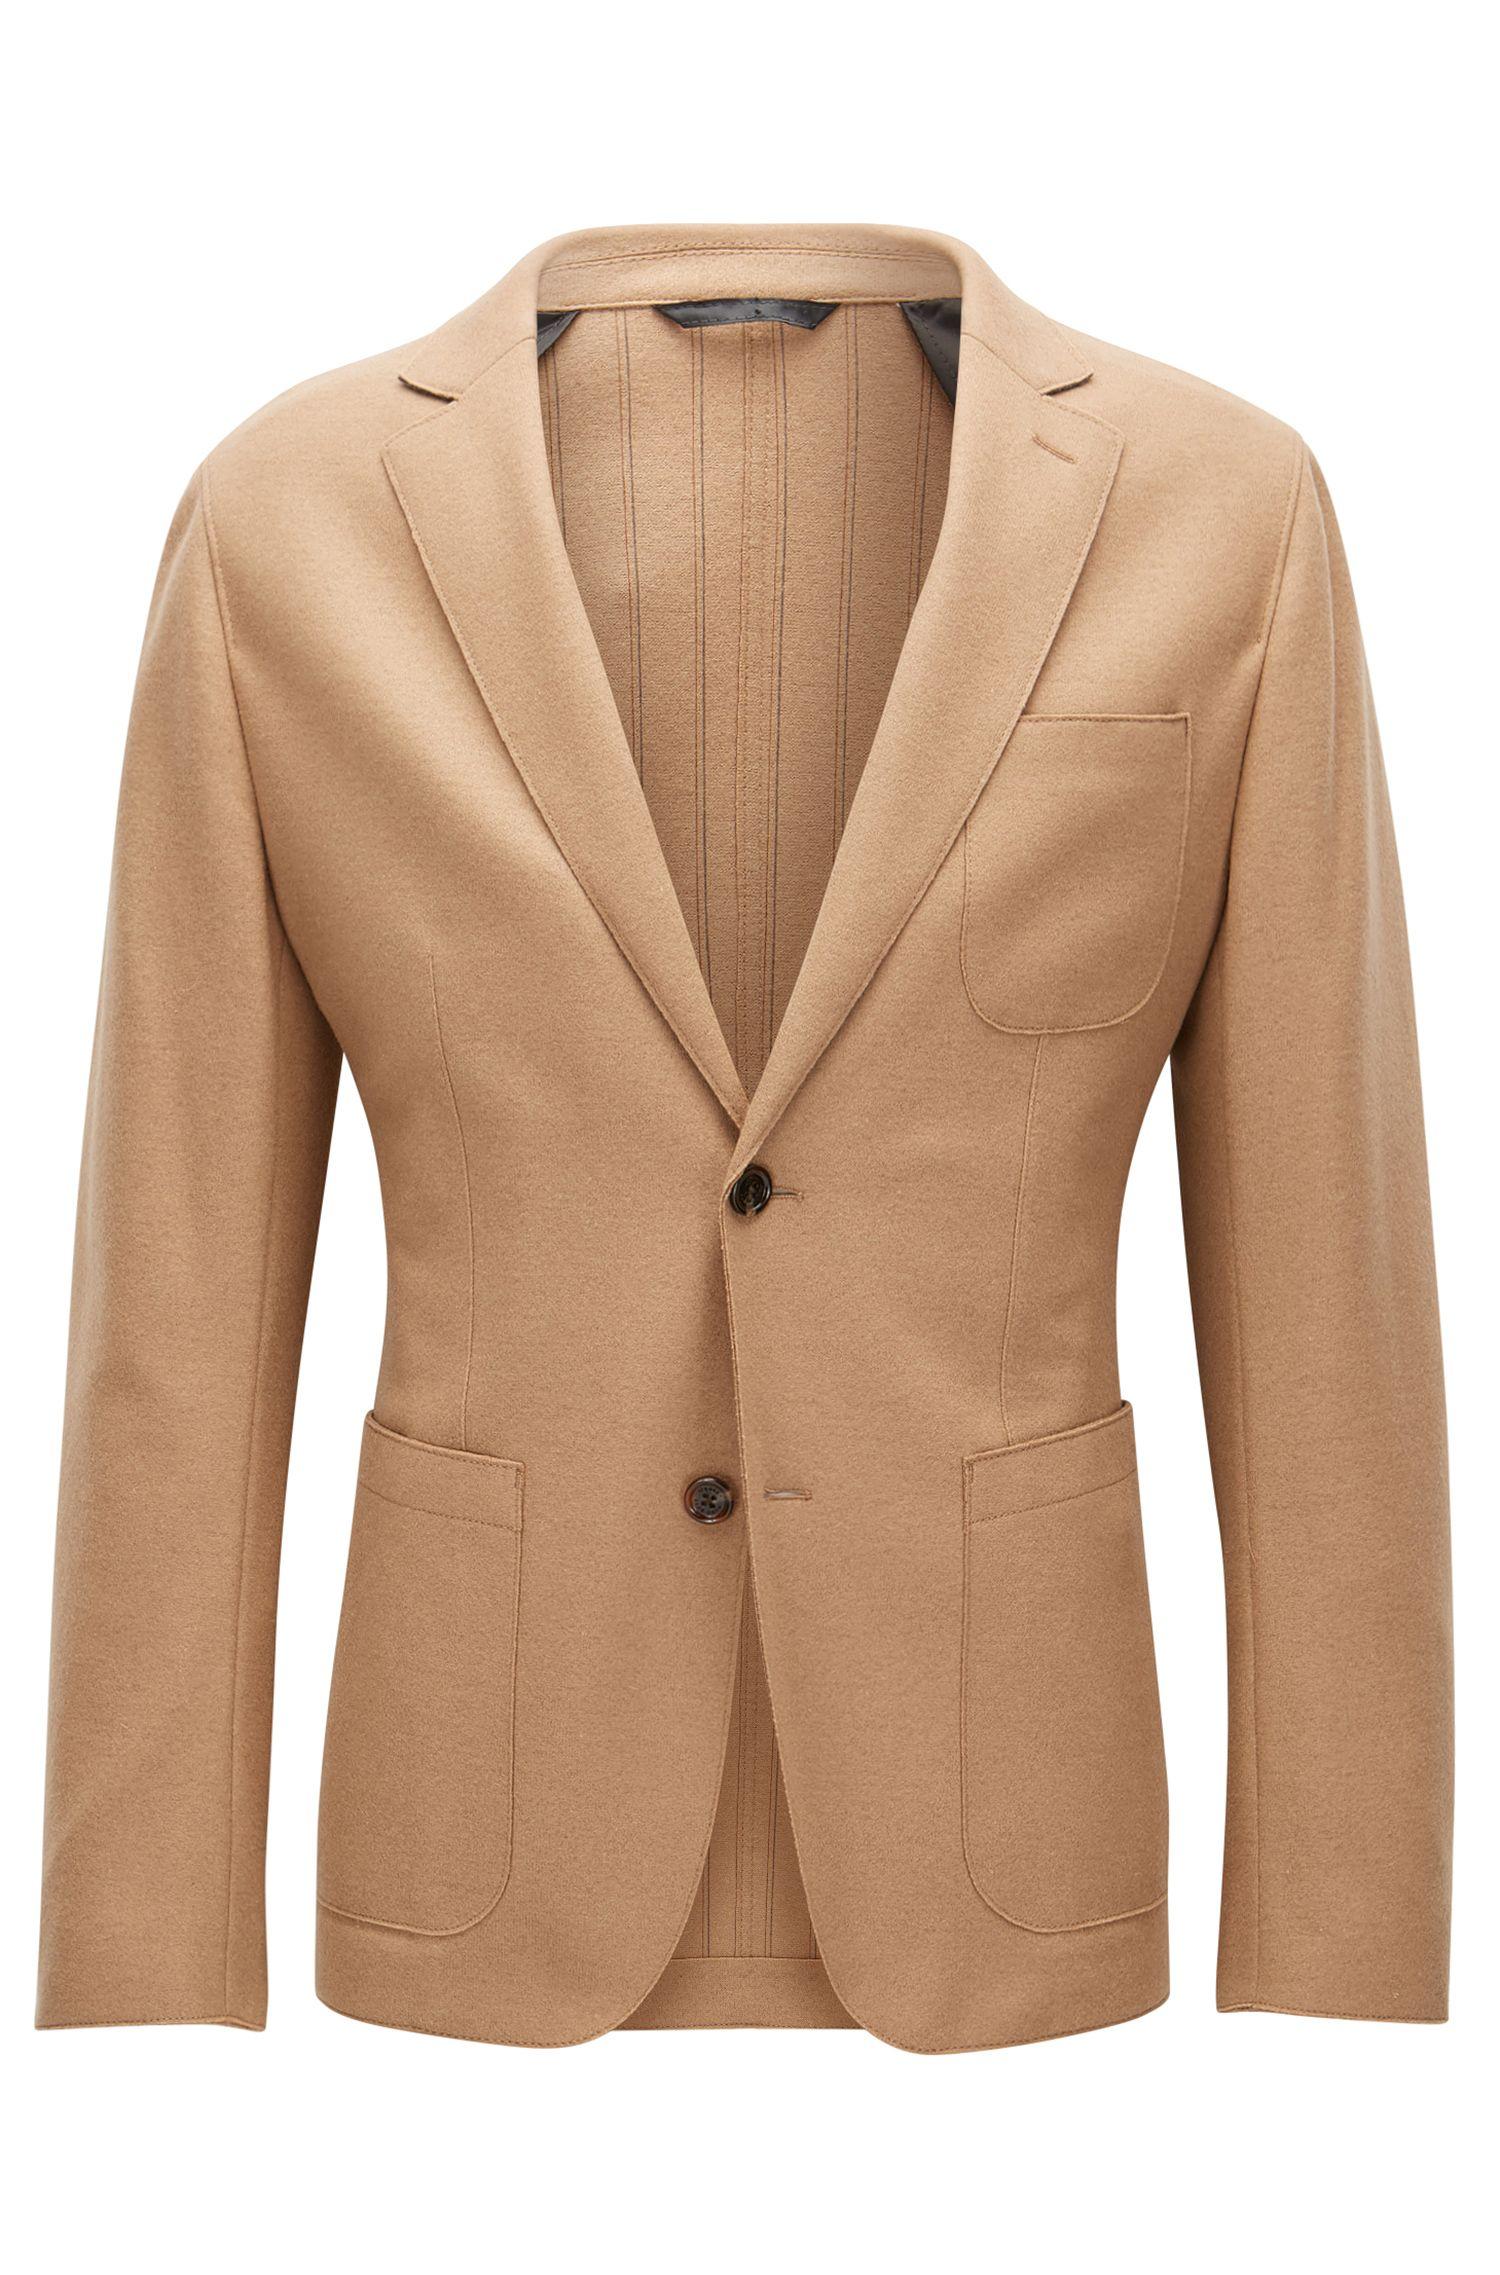 Virgin Wool Sport Coat, Slim Fit | Nordin